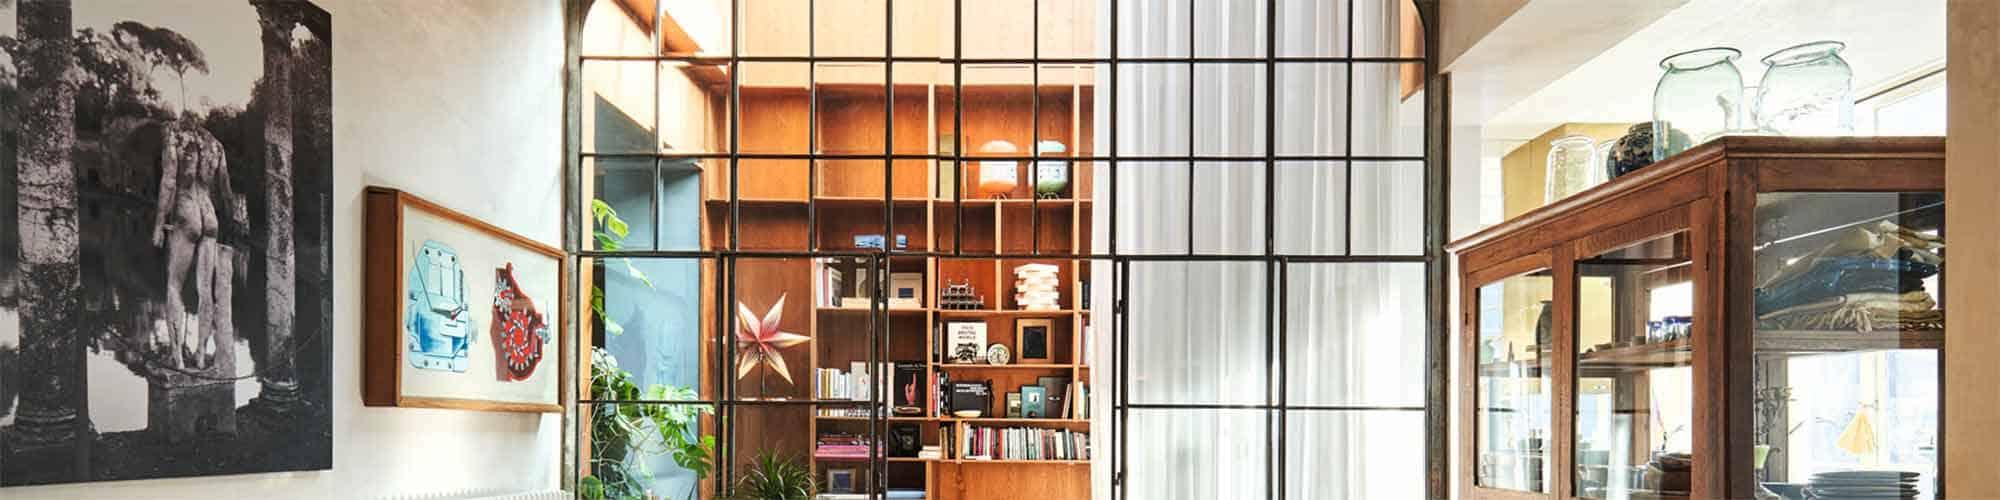 wohndesign magazin art room